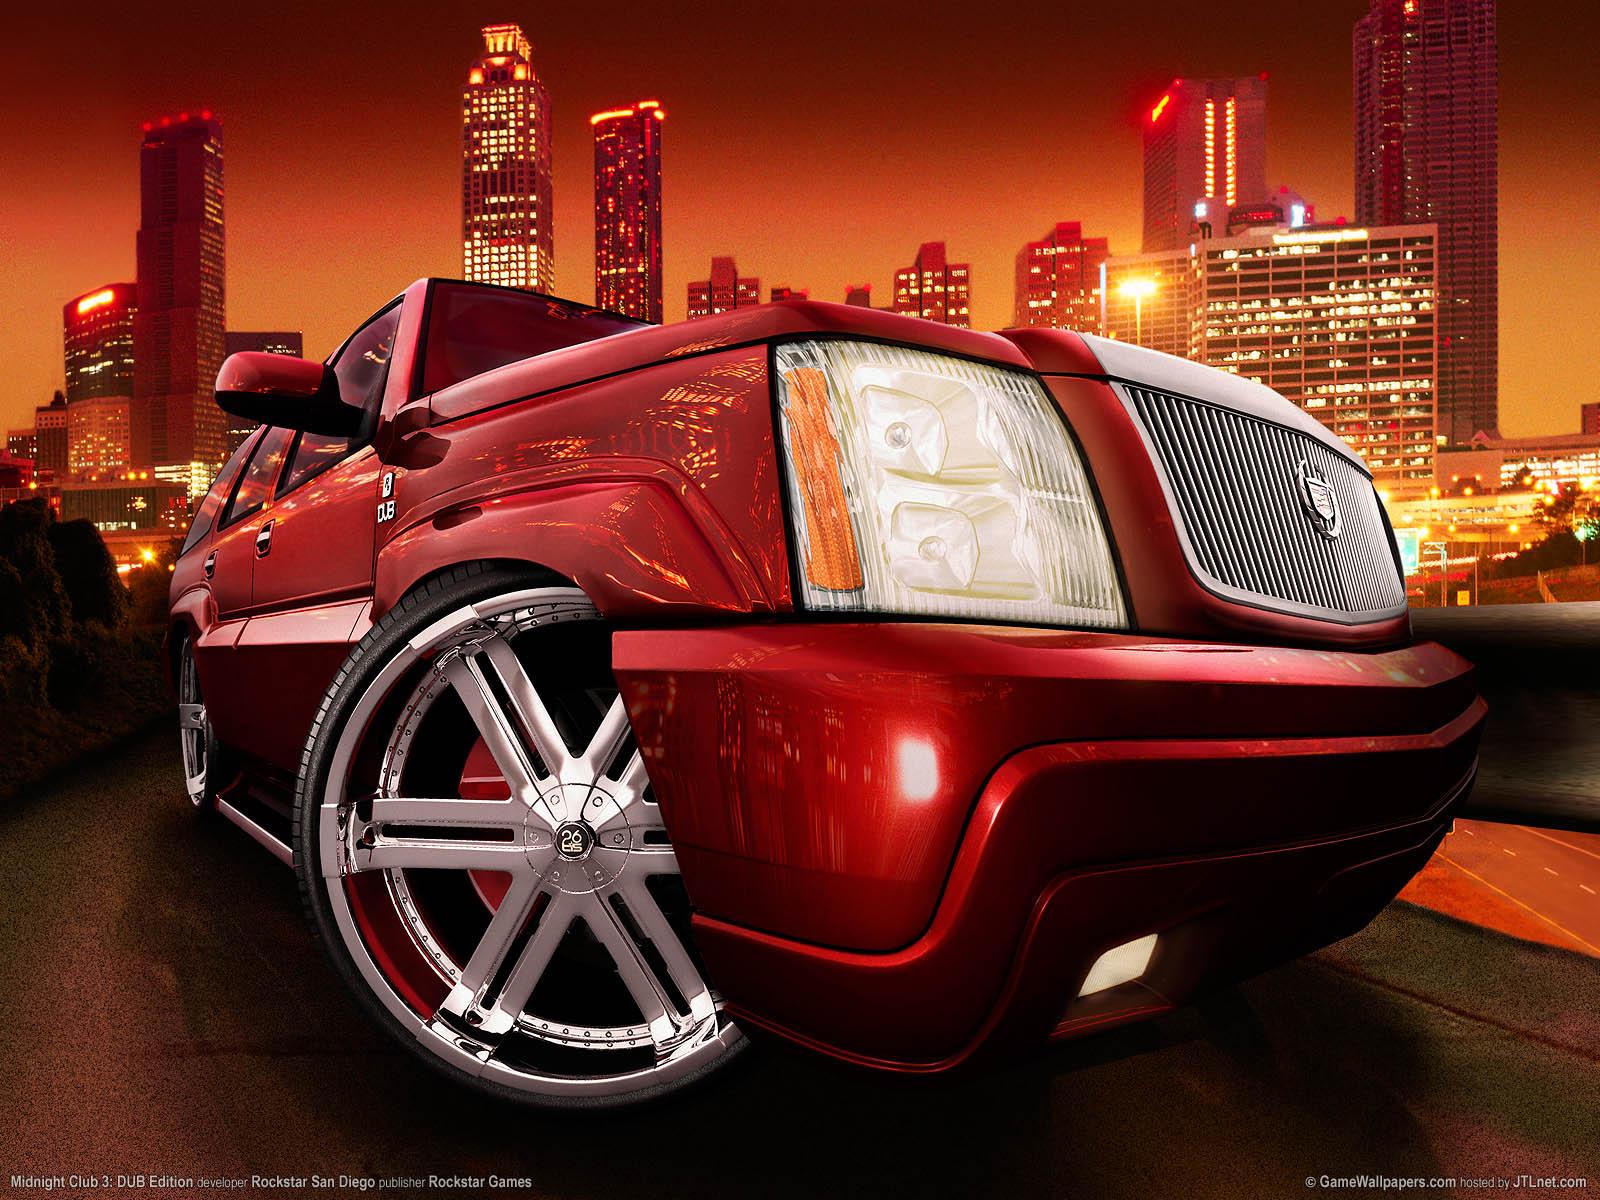 http://1.bp.blogspot.com/-L4UKokbhEWU/TxYpOx5THyI/AAAAAAAADXk/nA0TvtBAv1Q/s1600/wallpaper-carros-tunados-papeis-de-parede.jpg